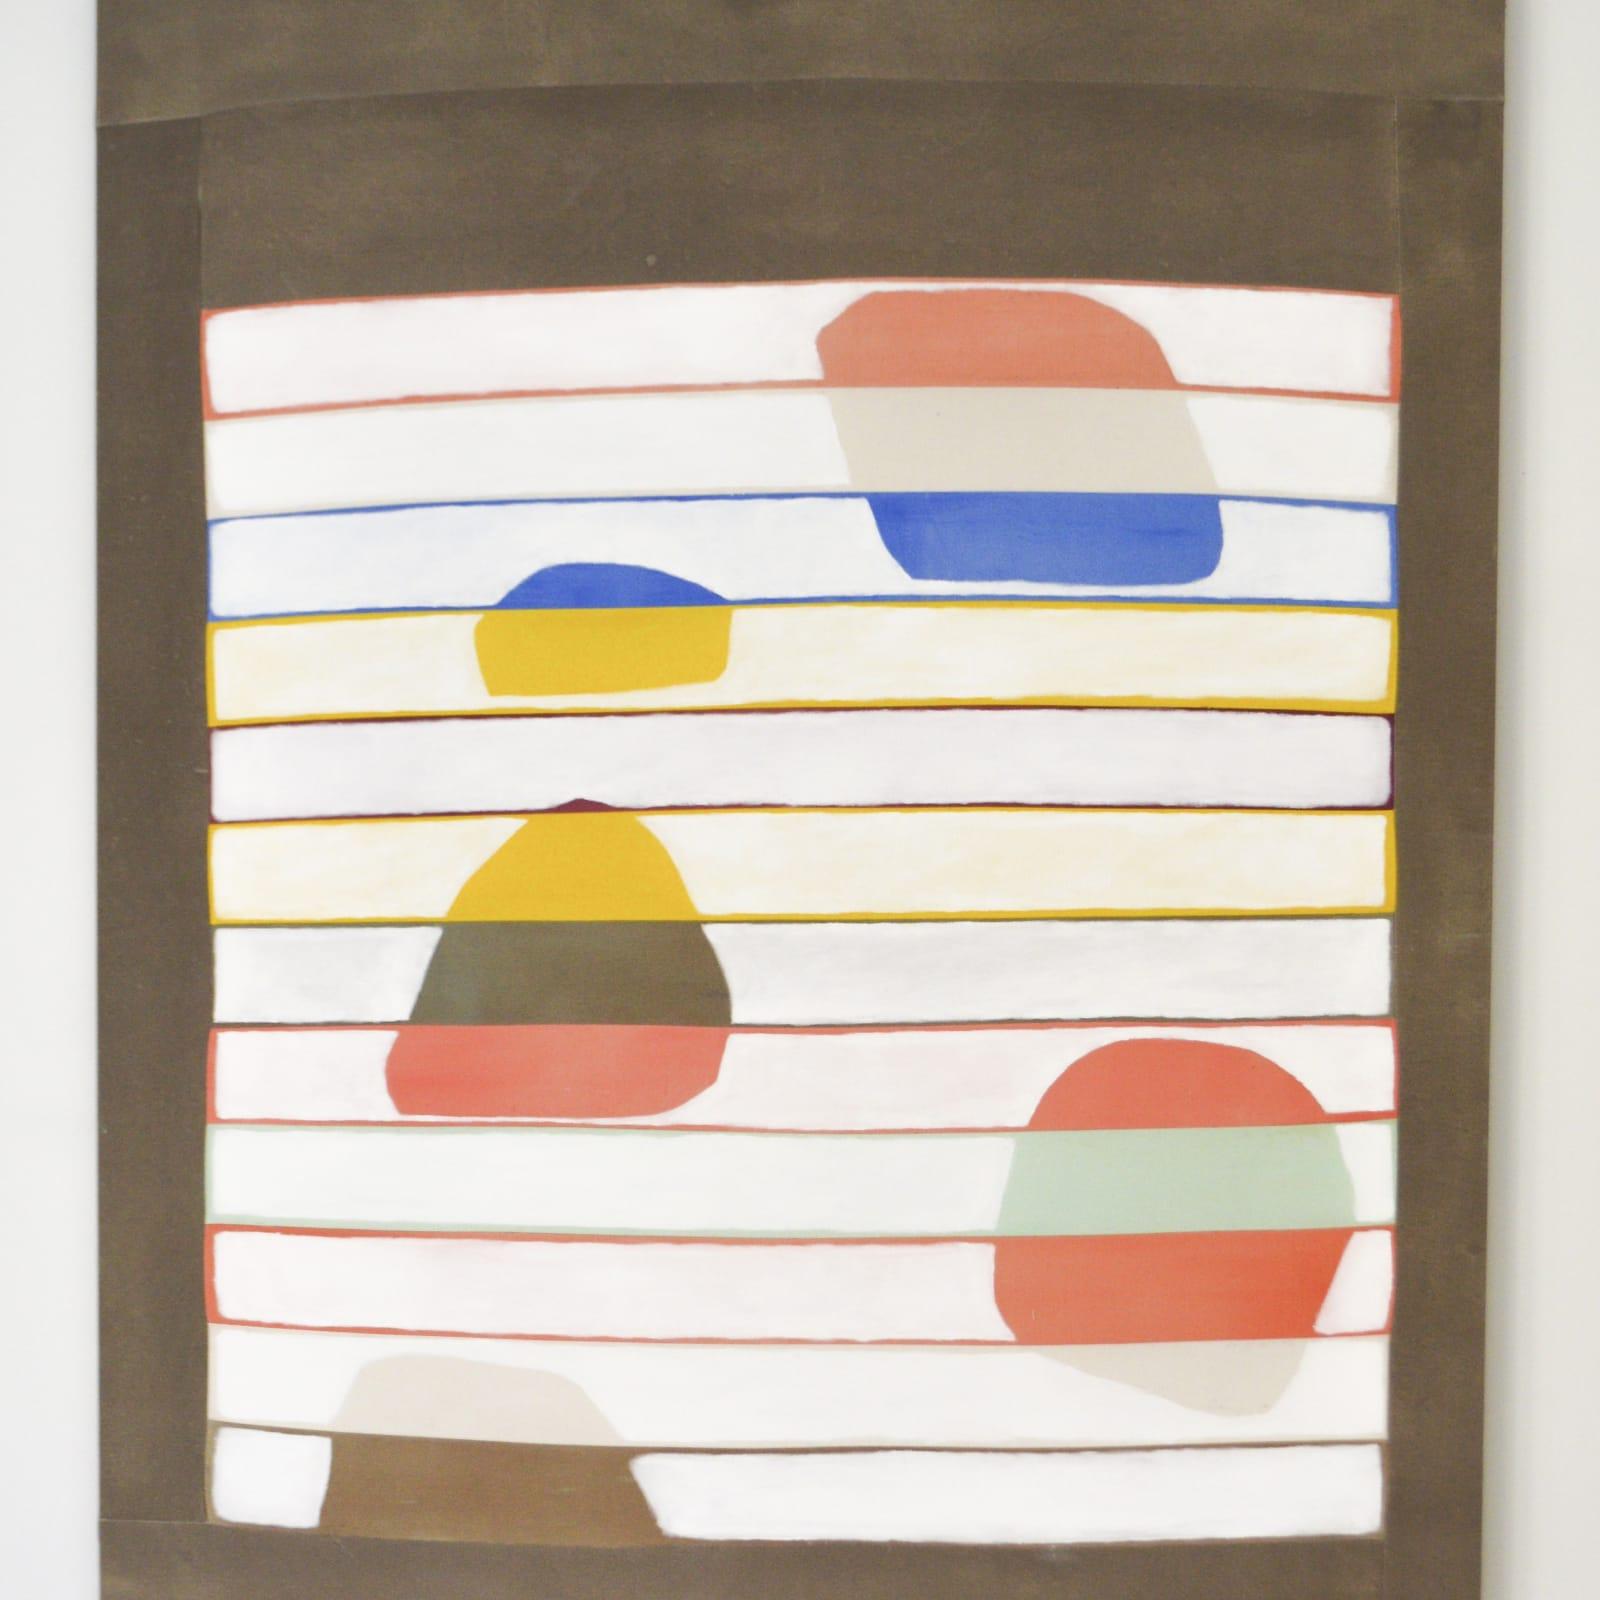 Luke Diiorio Untitled (4), 2018